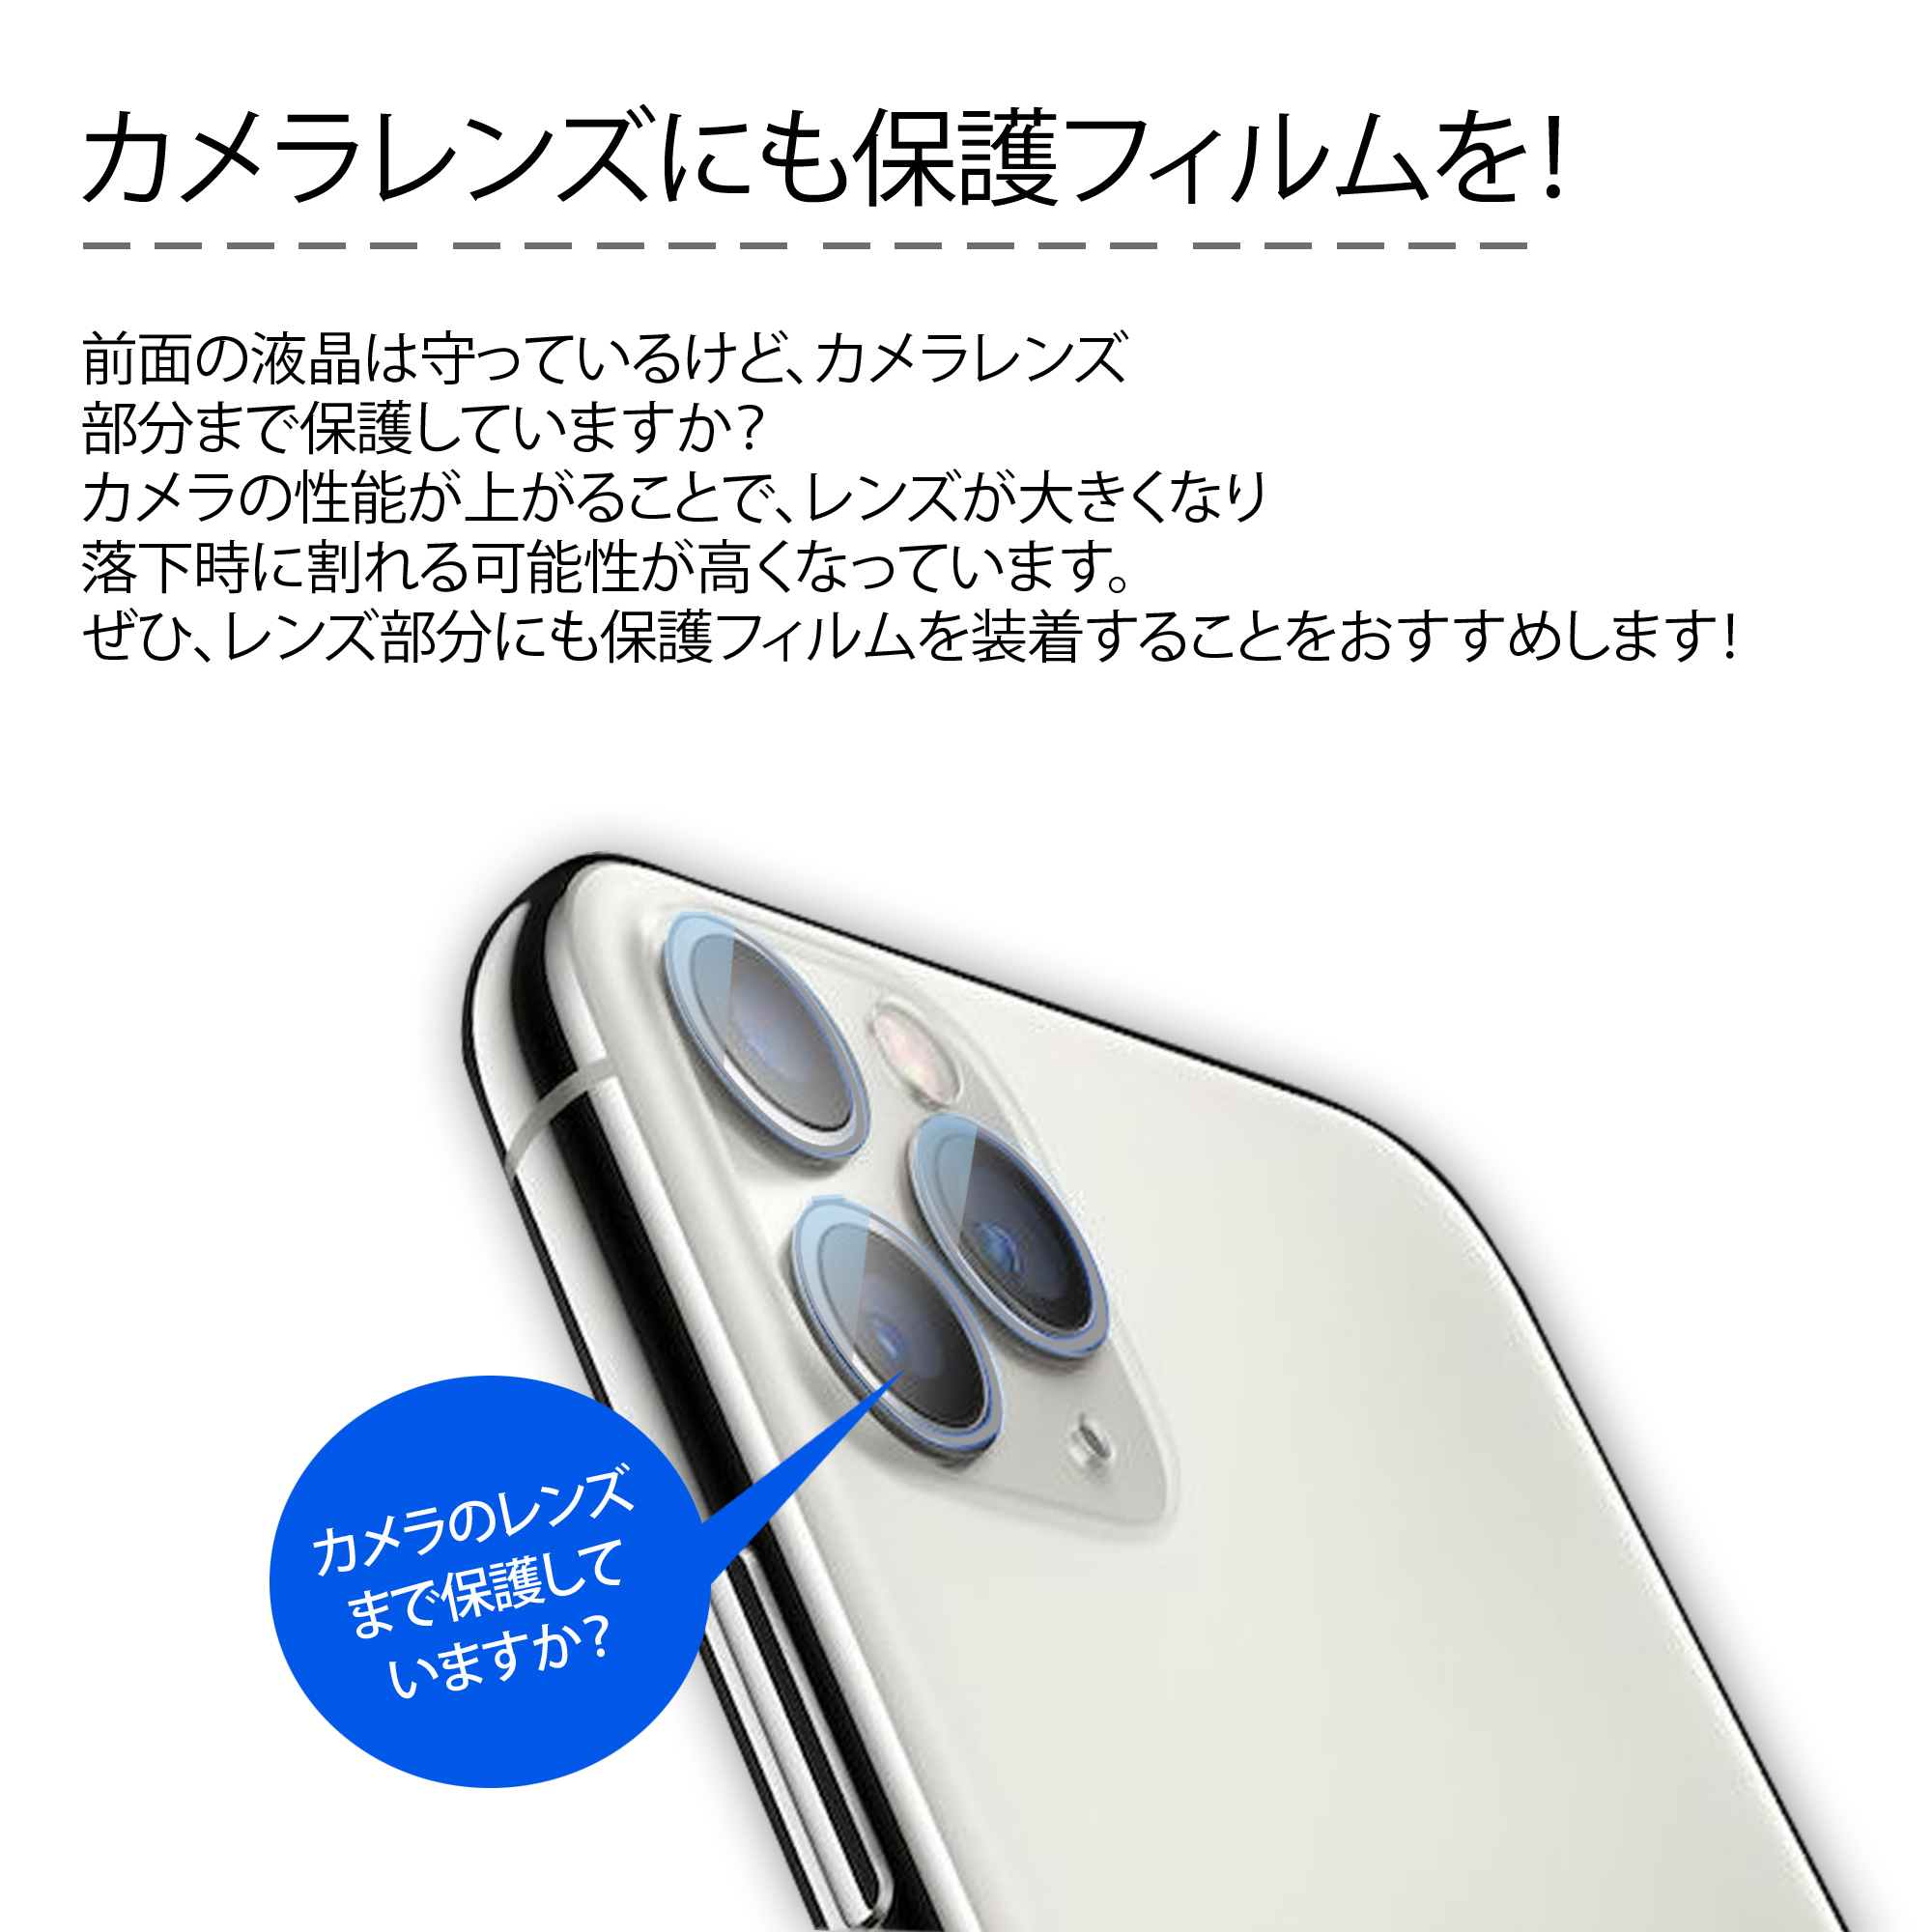 IPhone11 / IPhone11 Pro / IPhone11 Pro Max カメラレンズ 保護 ガラス